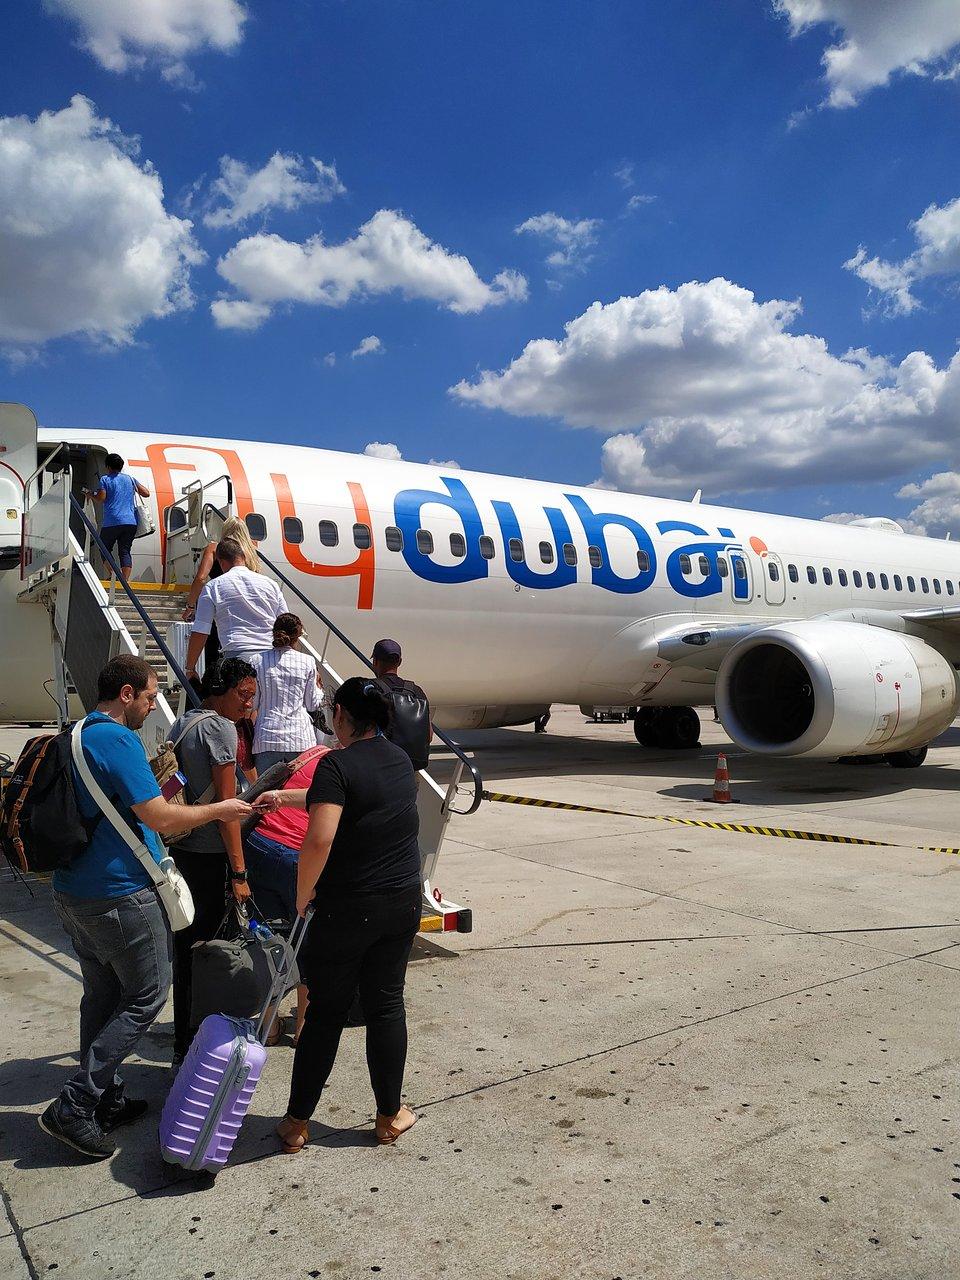 flydubai Flights and Reviews (with photos) - TripAdvisor